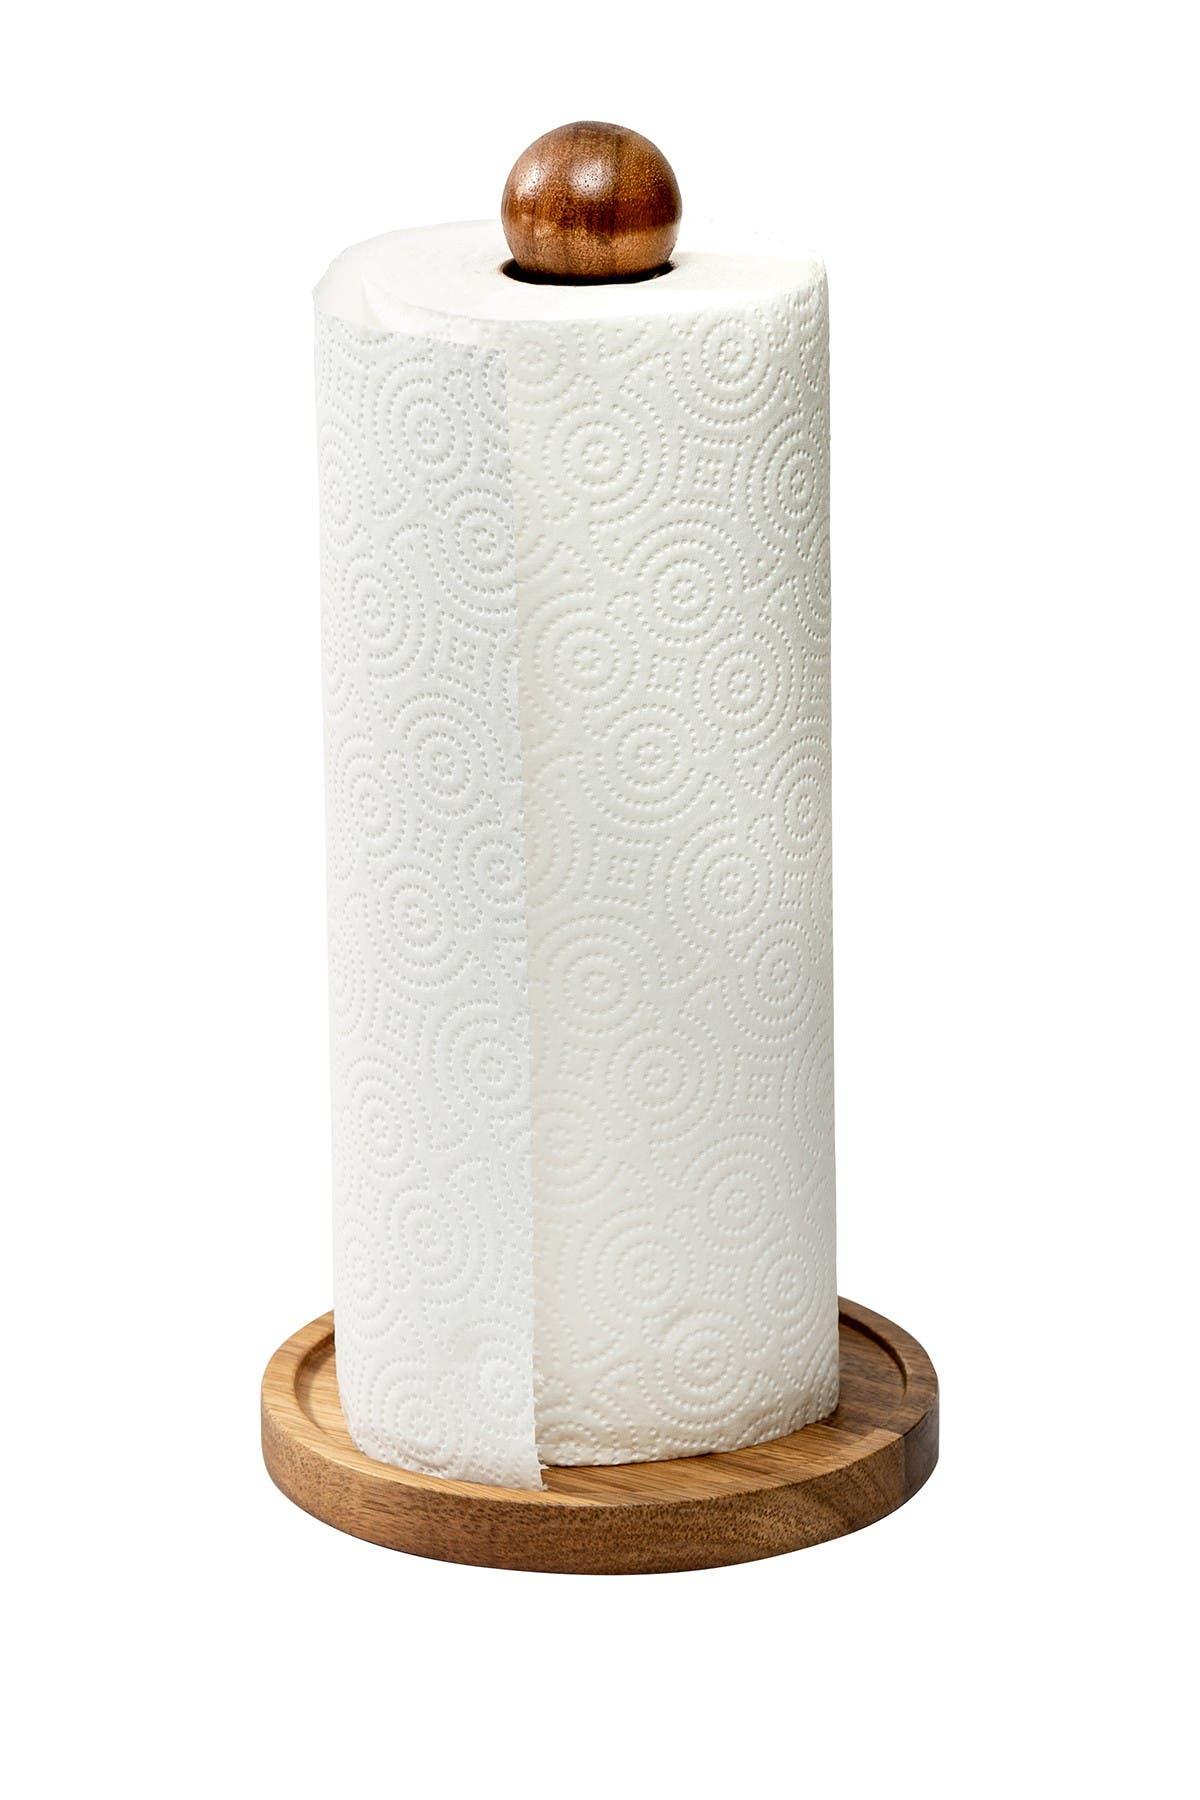 Image of Honey-Can-Do Acacia Paper Towel Holder